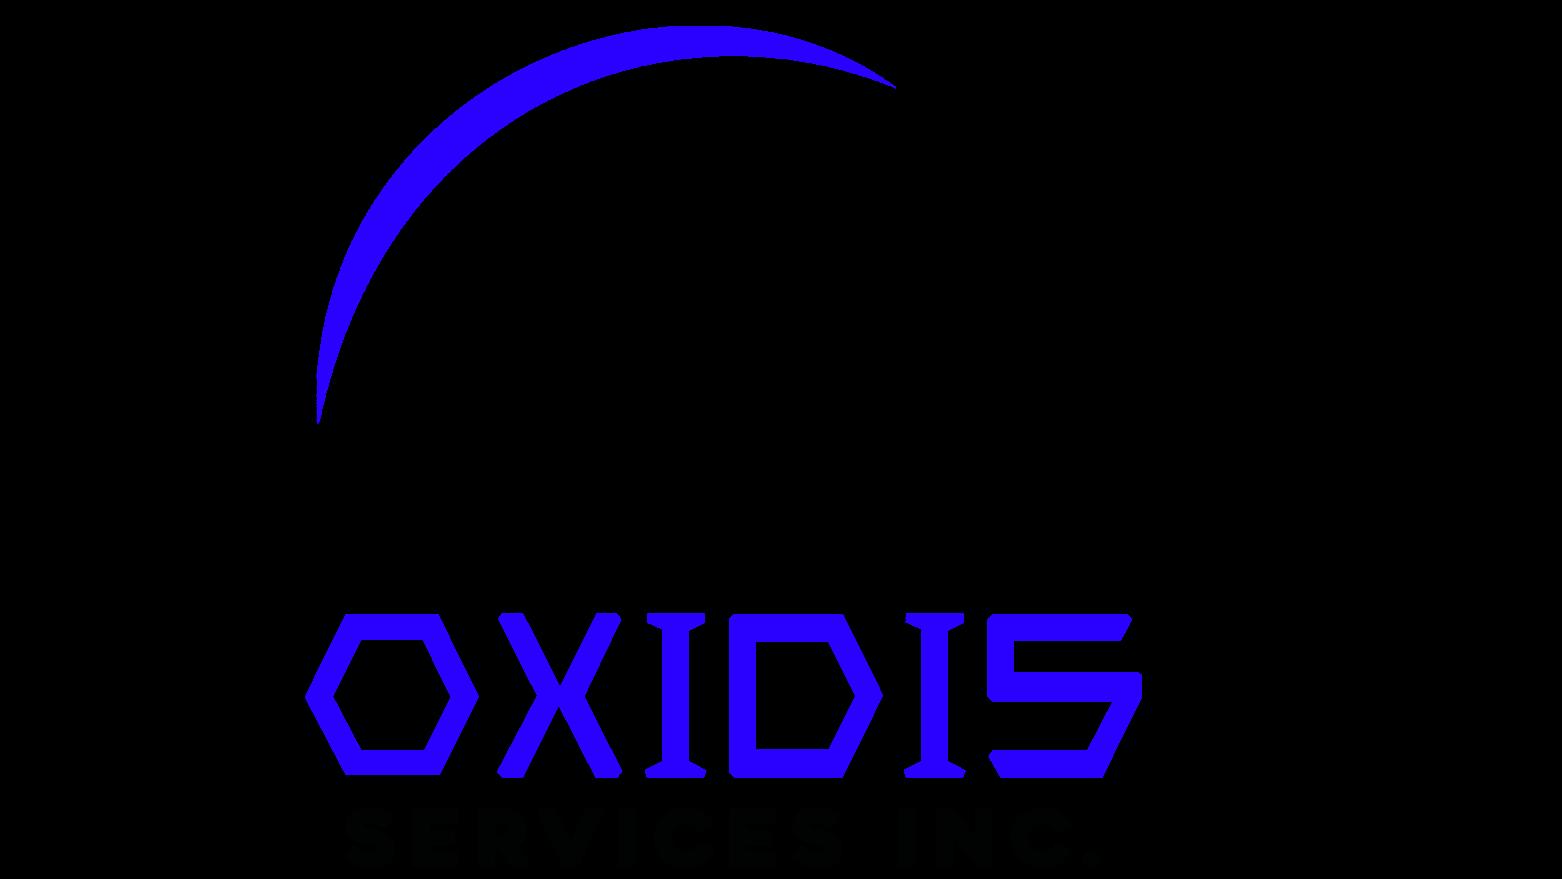 OXIDIS Services